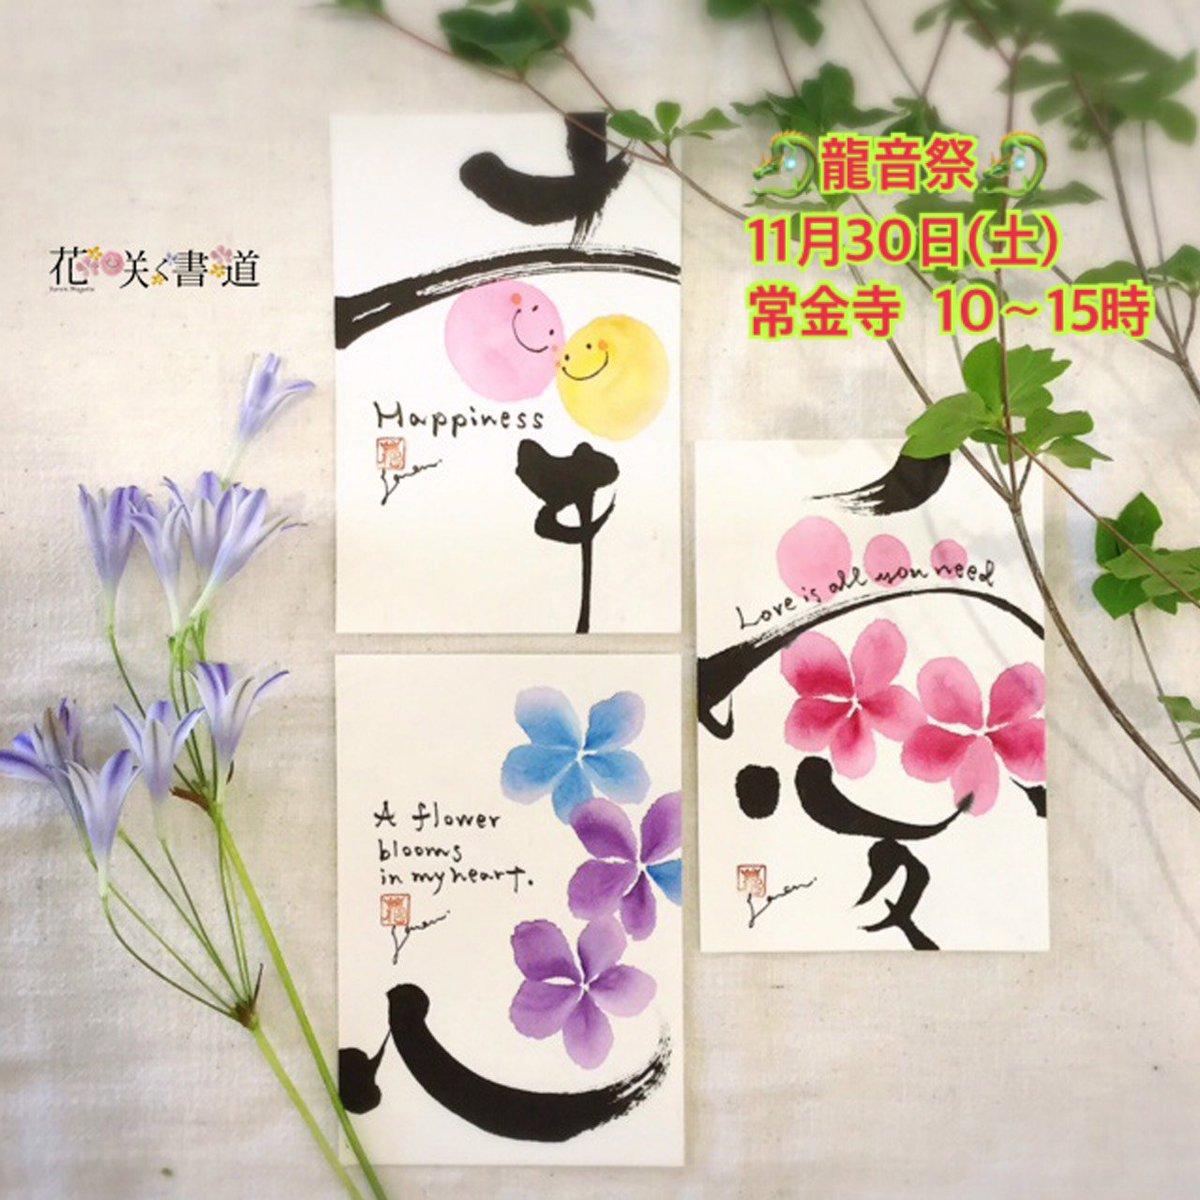 test ツイッターメディア - 龍音祭 ワークショップ出店  🌸永田紗戀の花咲く書道  ワンコイン(¥500)で書と絵が描けます。  今年の年賀状は、手描きの書と花で いかがですか😊  ステキな、可愛い、ポストカードも揃えて、お待ちしてます。 https://t.co/my6h2acCdz